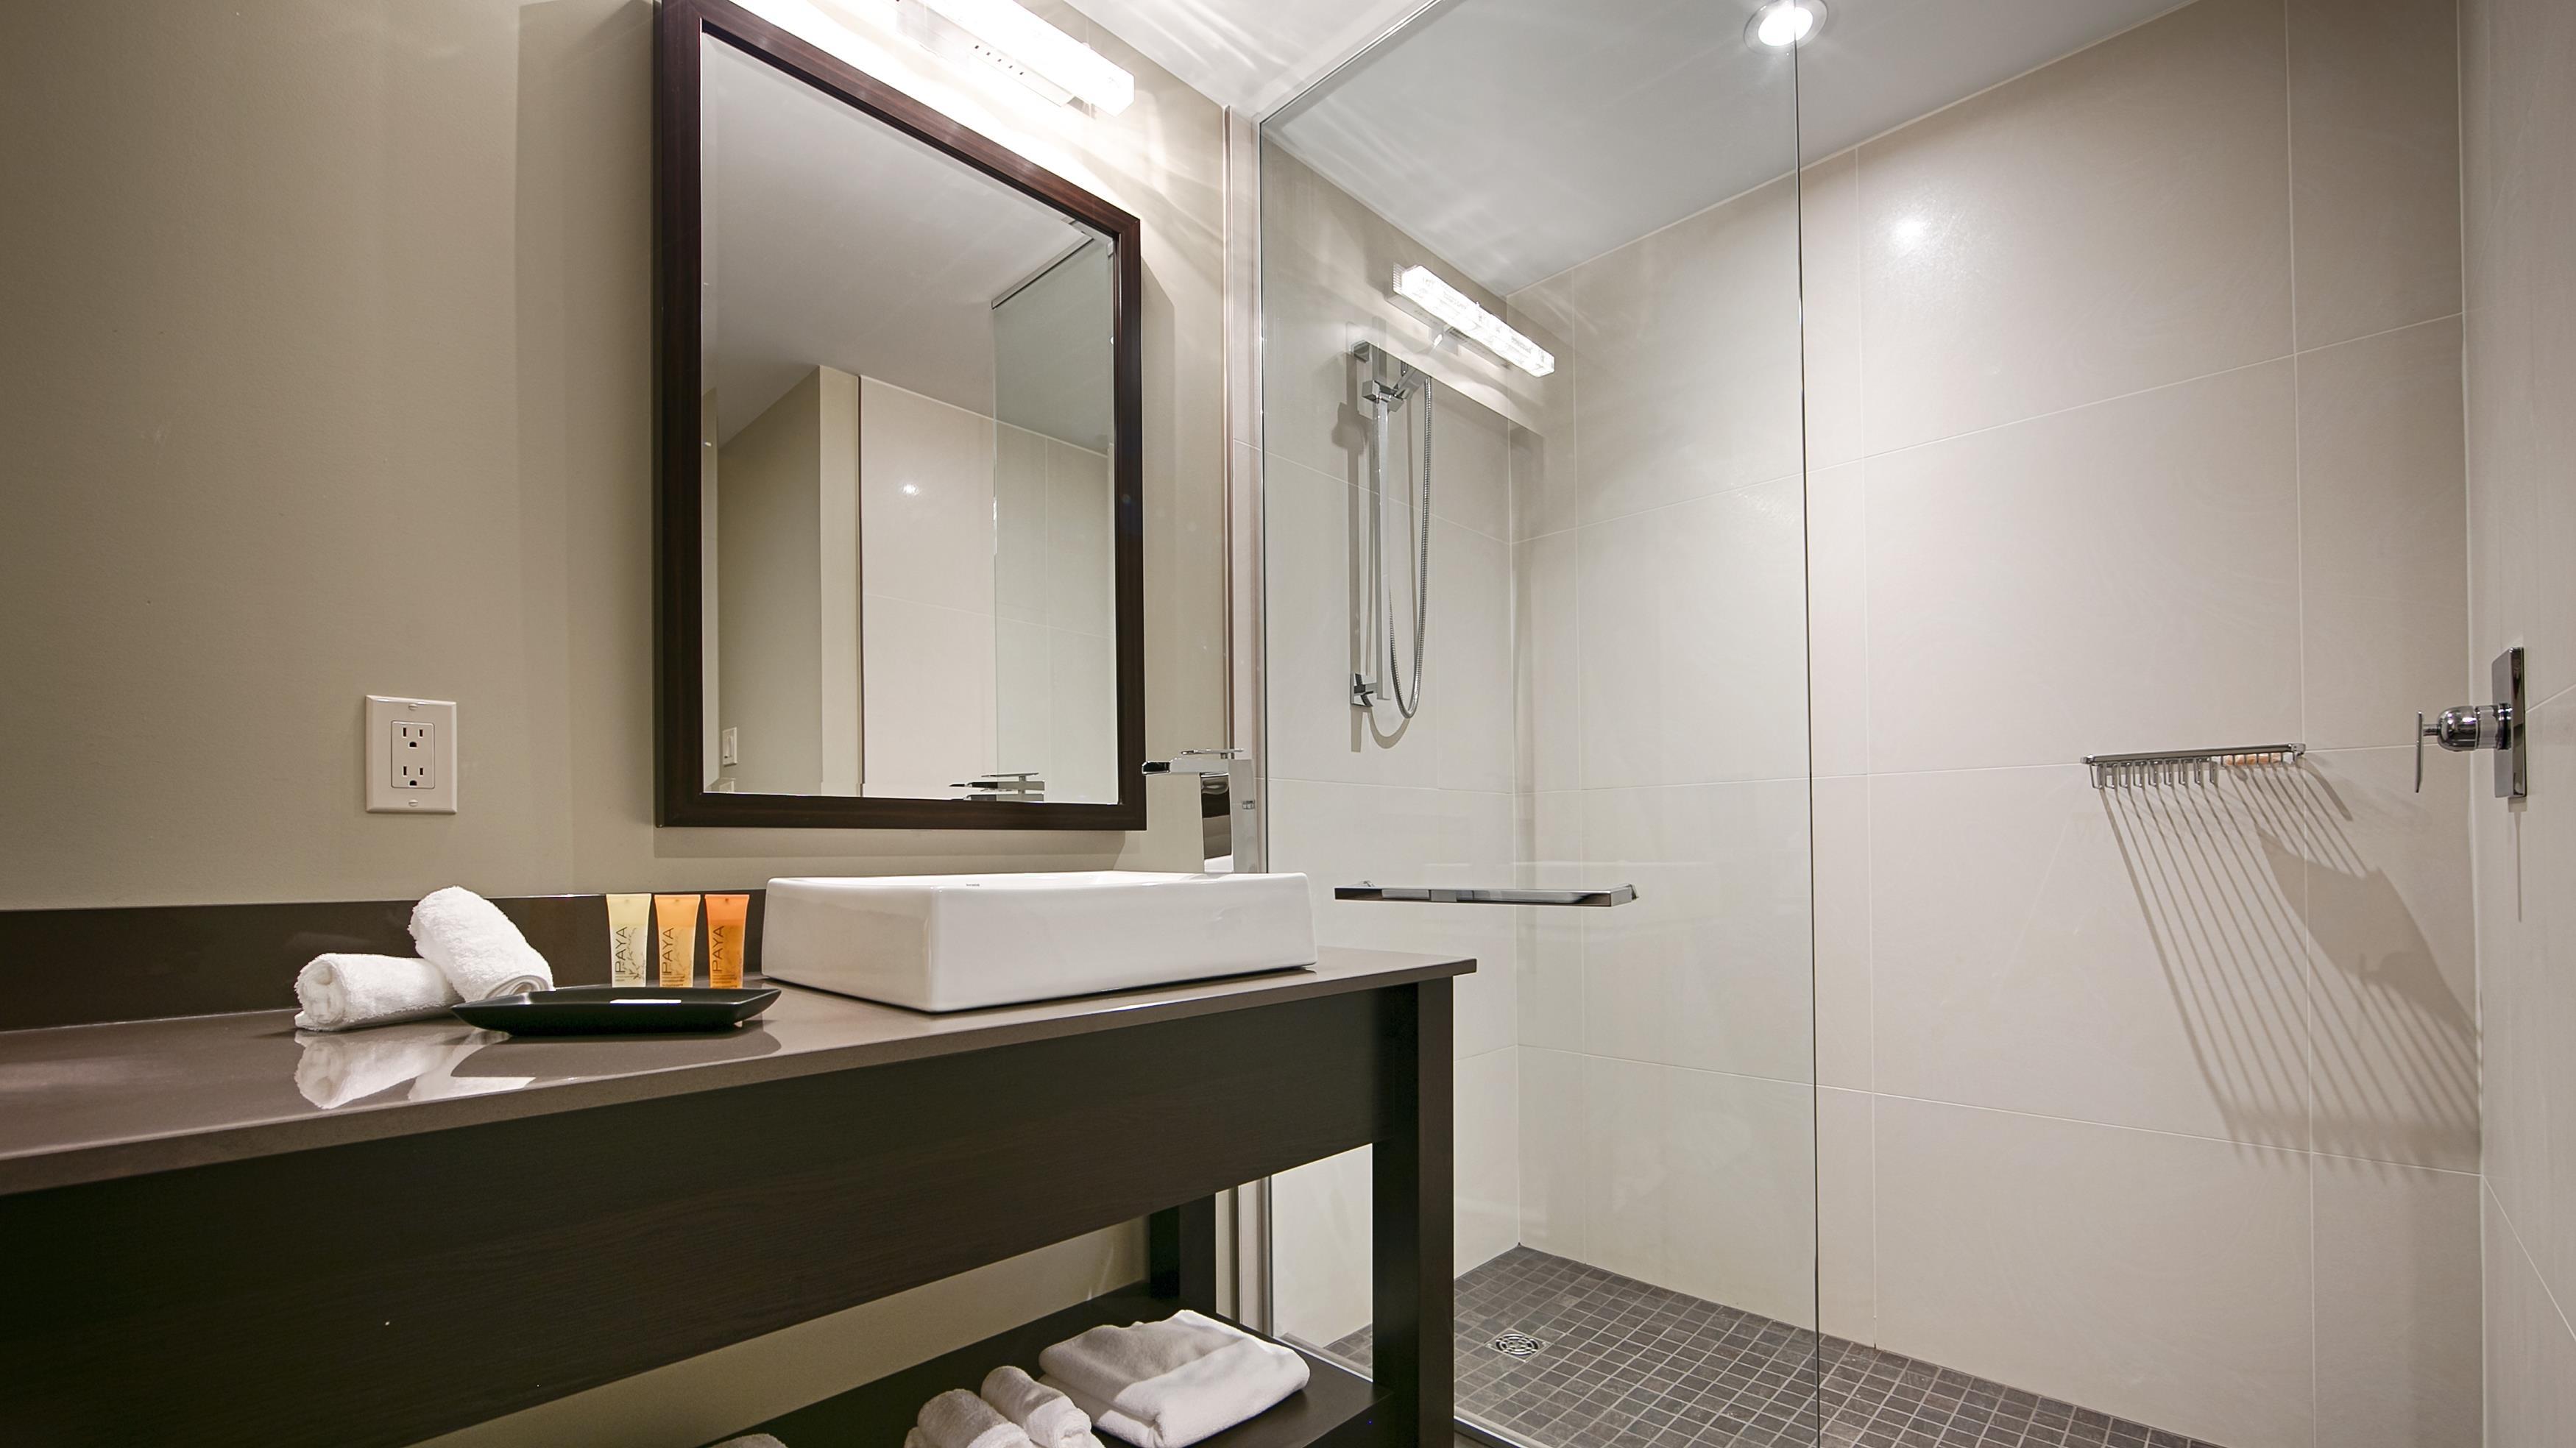 Best Western Plus Hotel Levesque à Riviere-du-Loup: Terra Aqua Bathroom